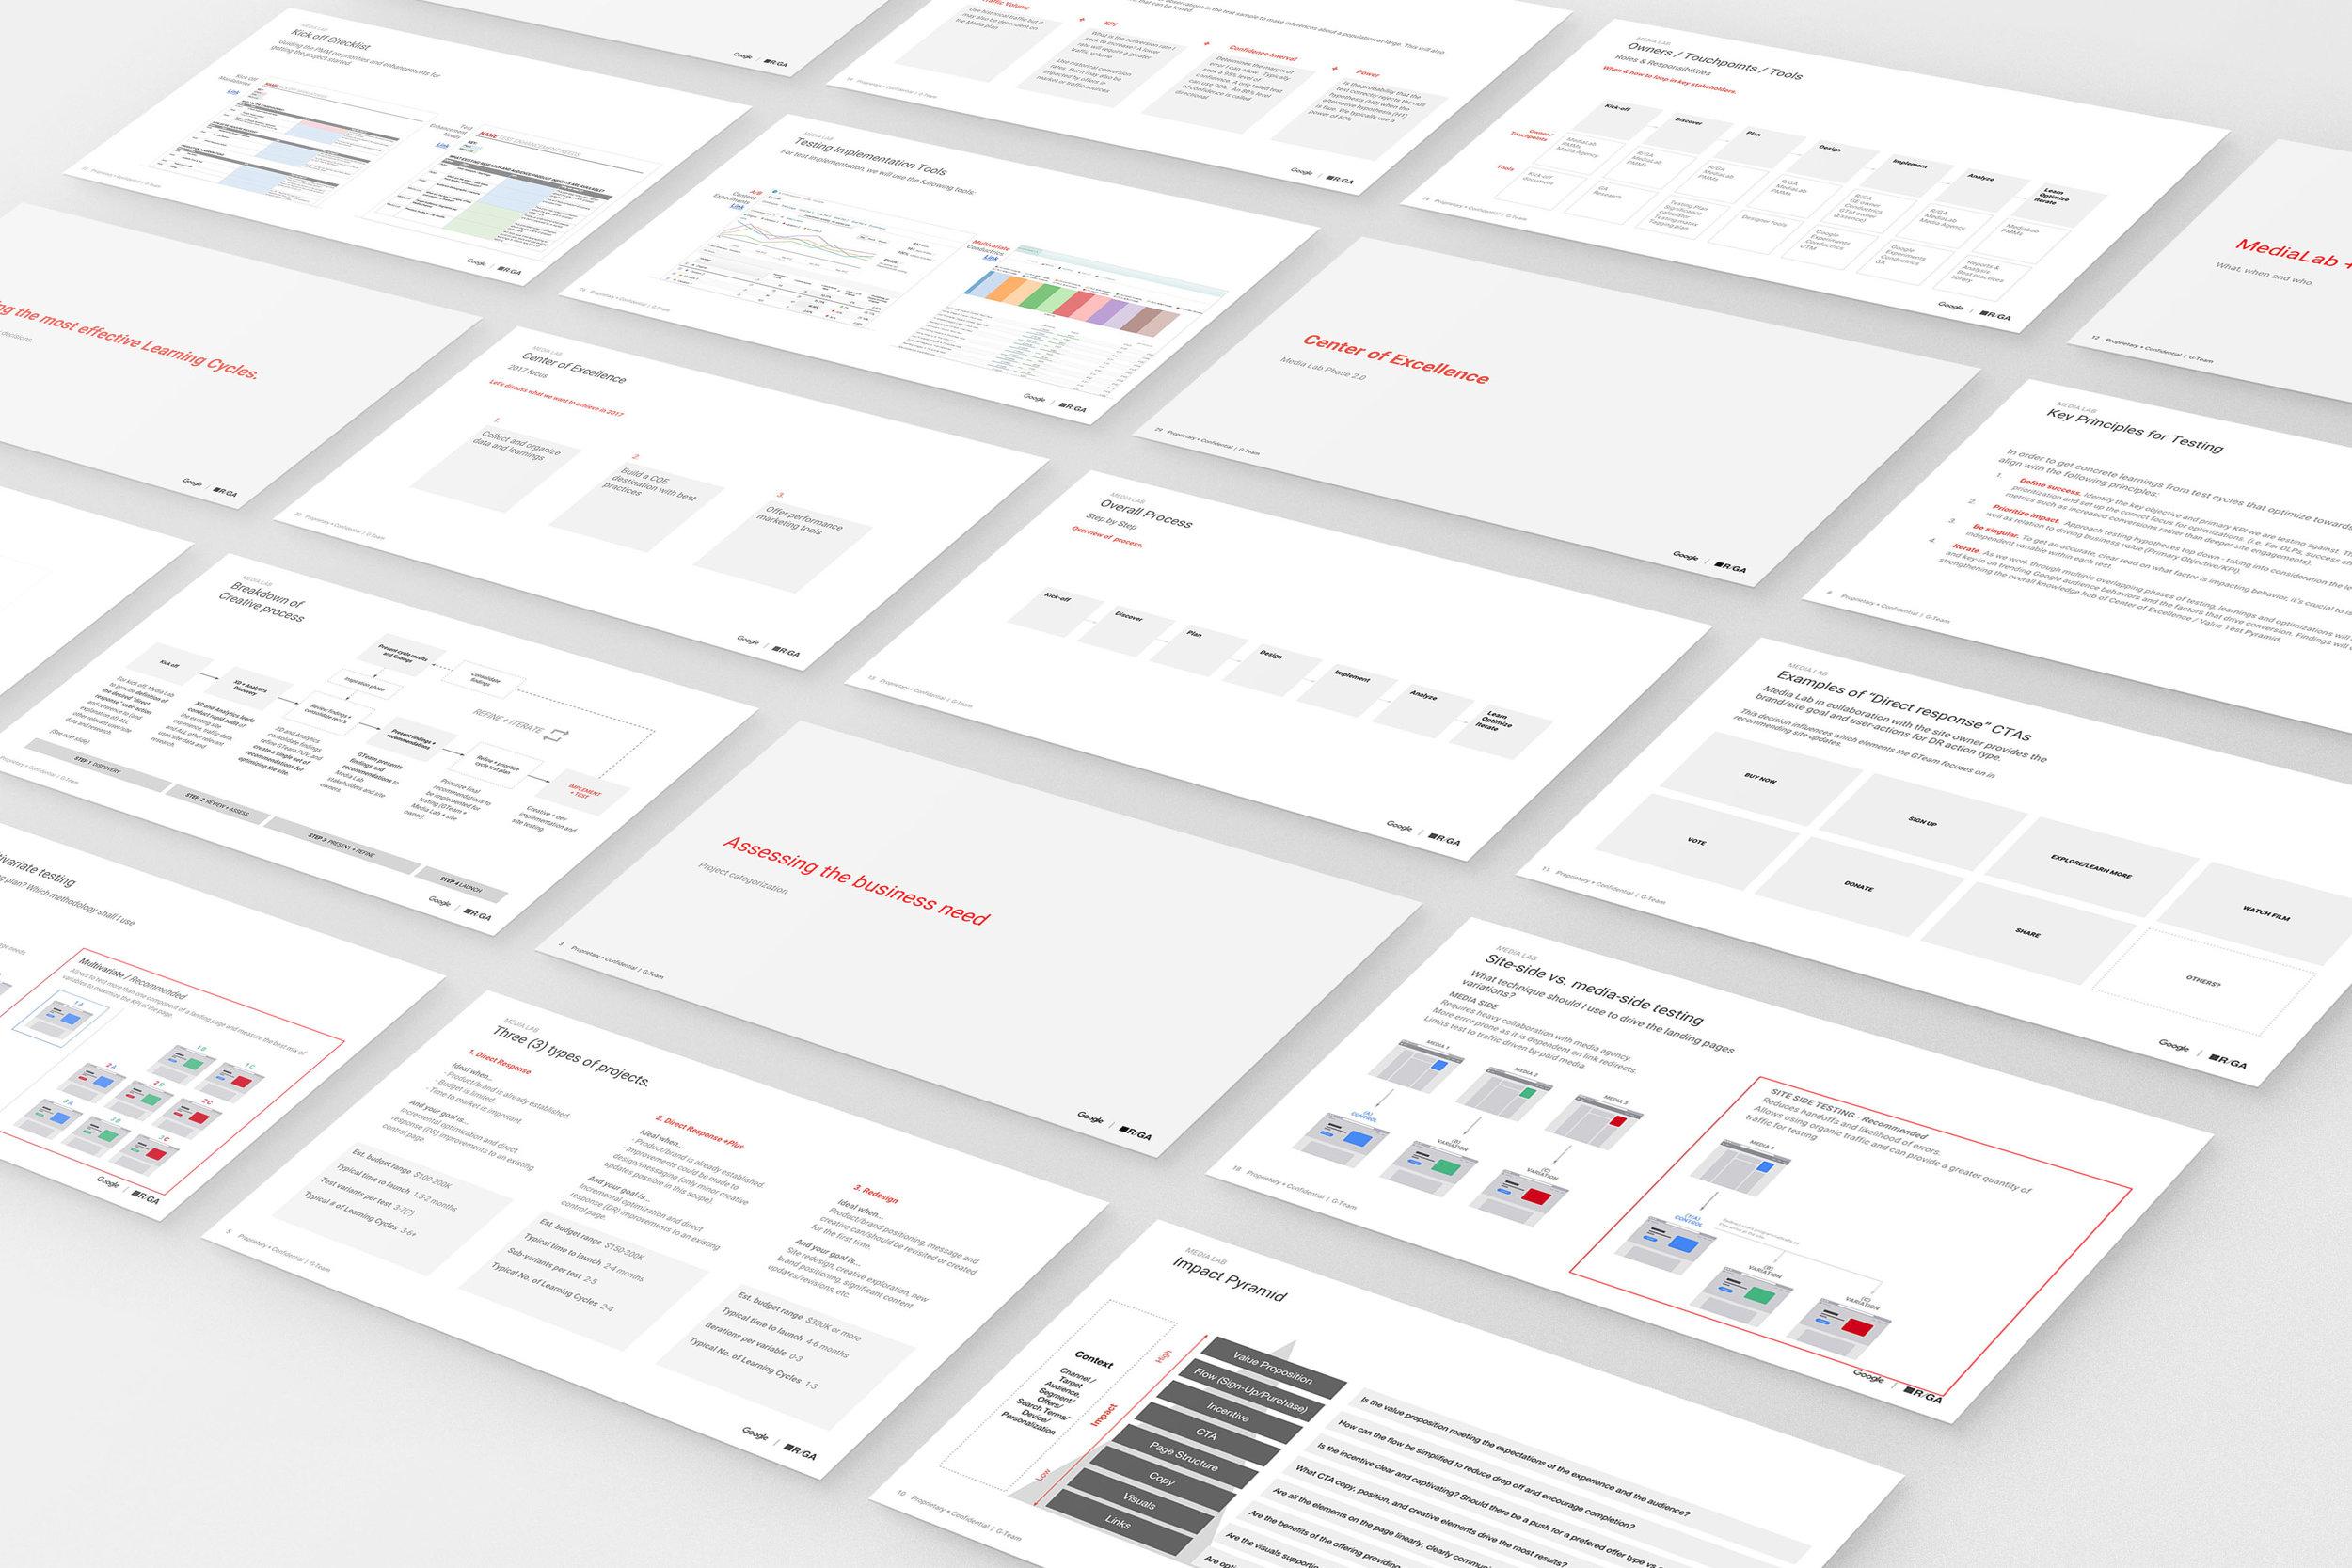 Defining cross-functional process for rapid design optimization - GOOGLE MEDIA LAB & R/GA | Process Design